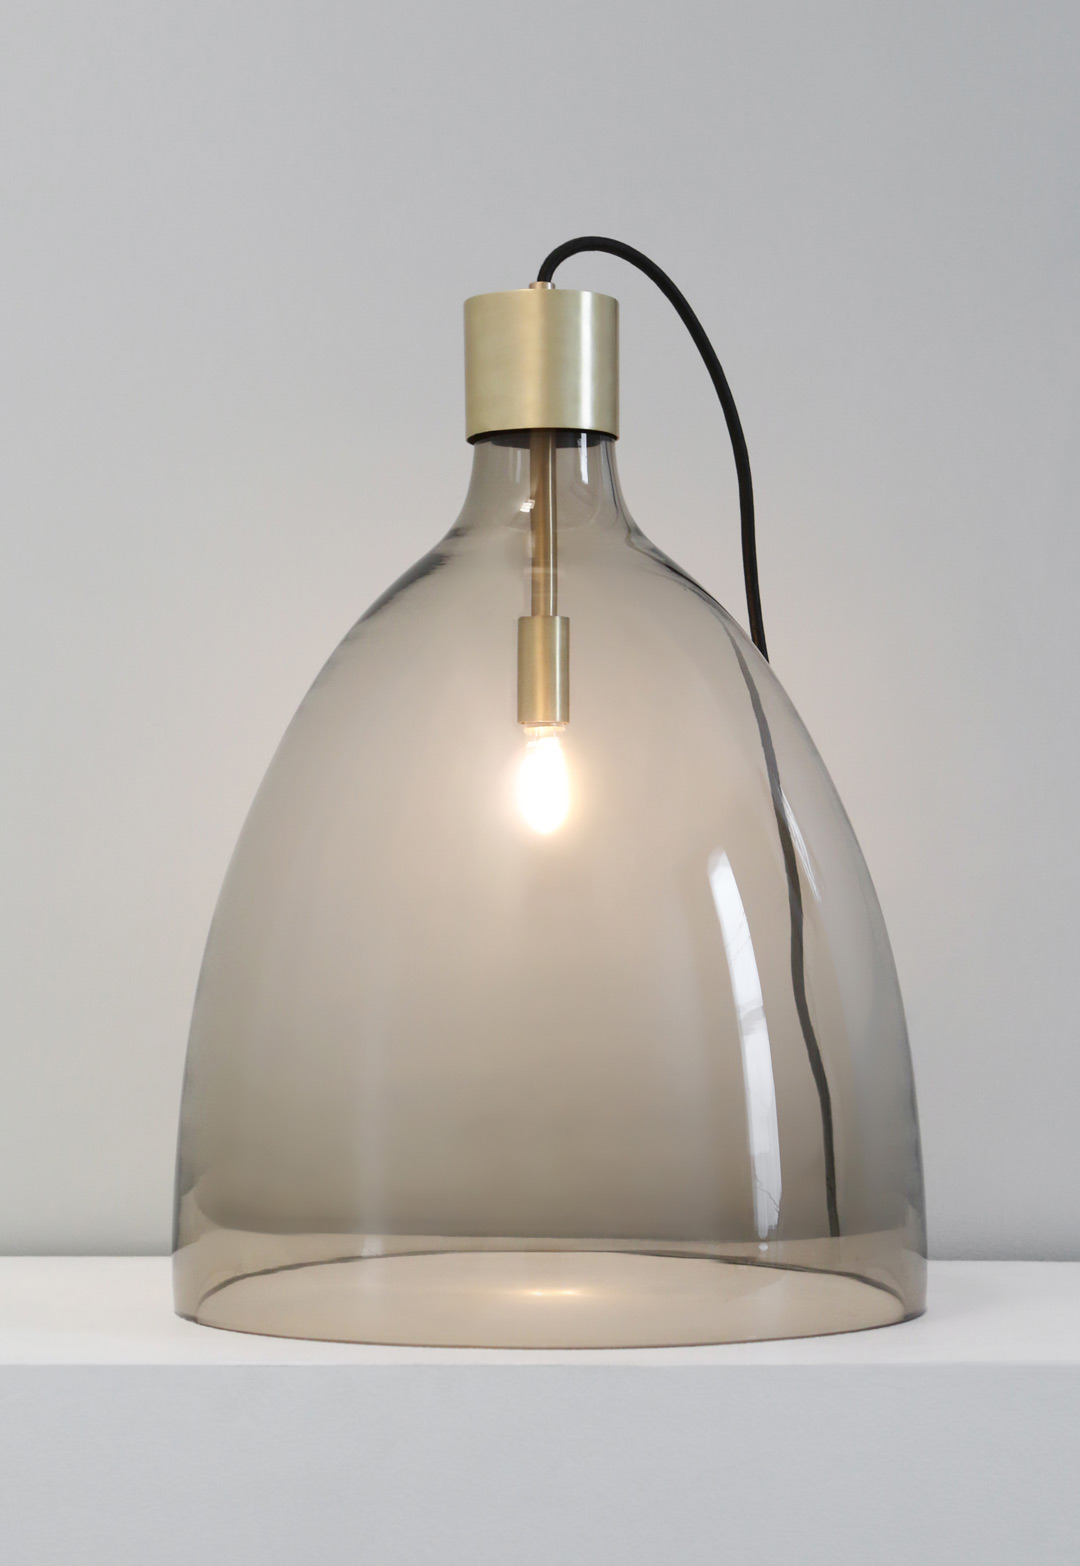 BELL JAR LIGHT TALL Olivin glass, brushed brass metal finish